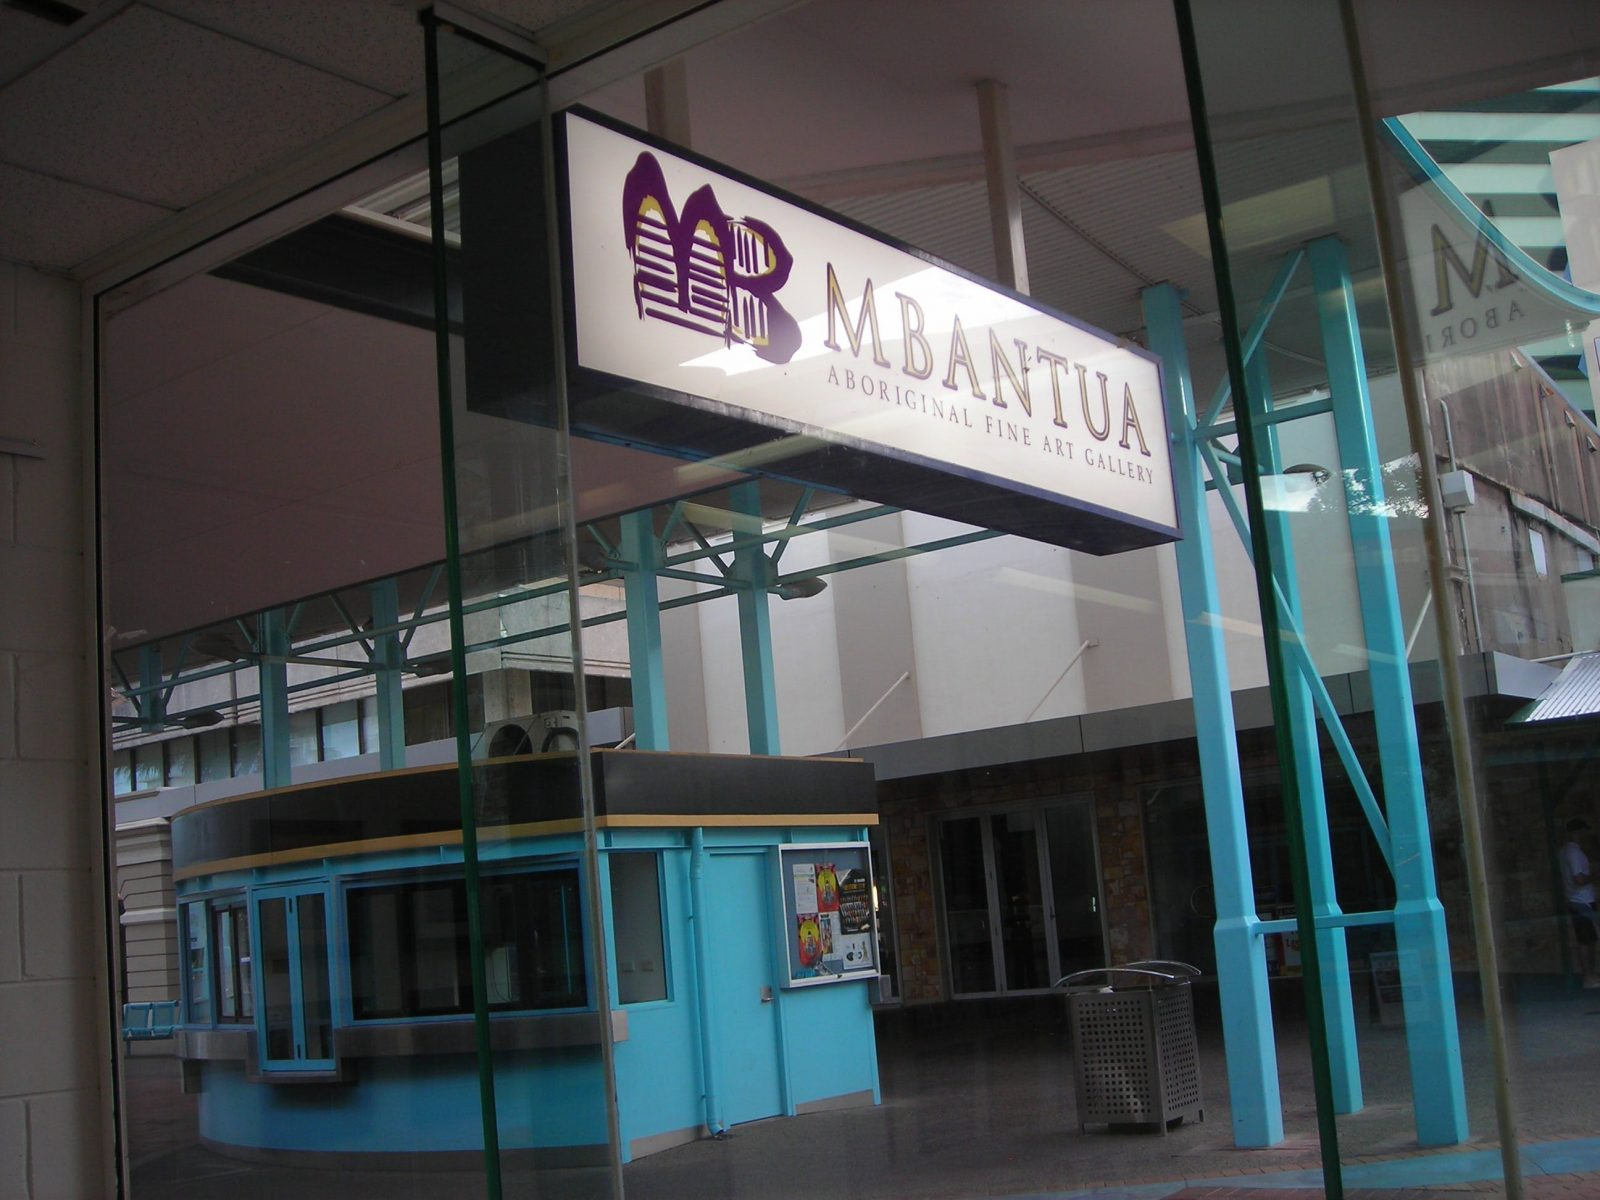 Mbantua Gallery Darwin frontage